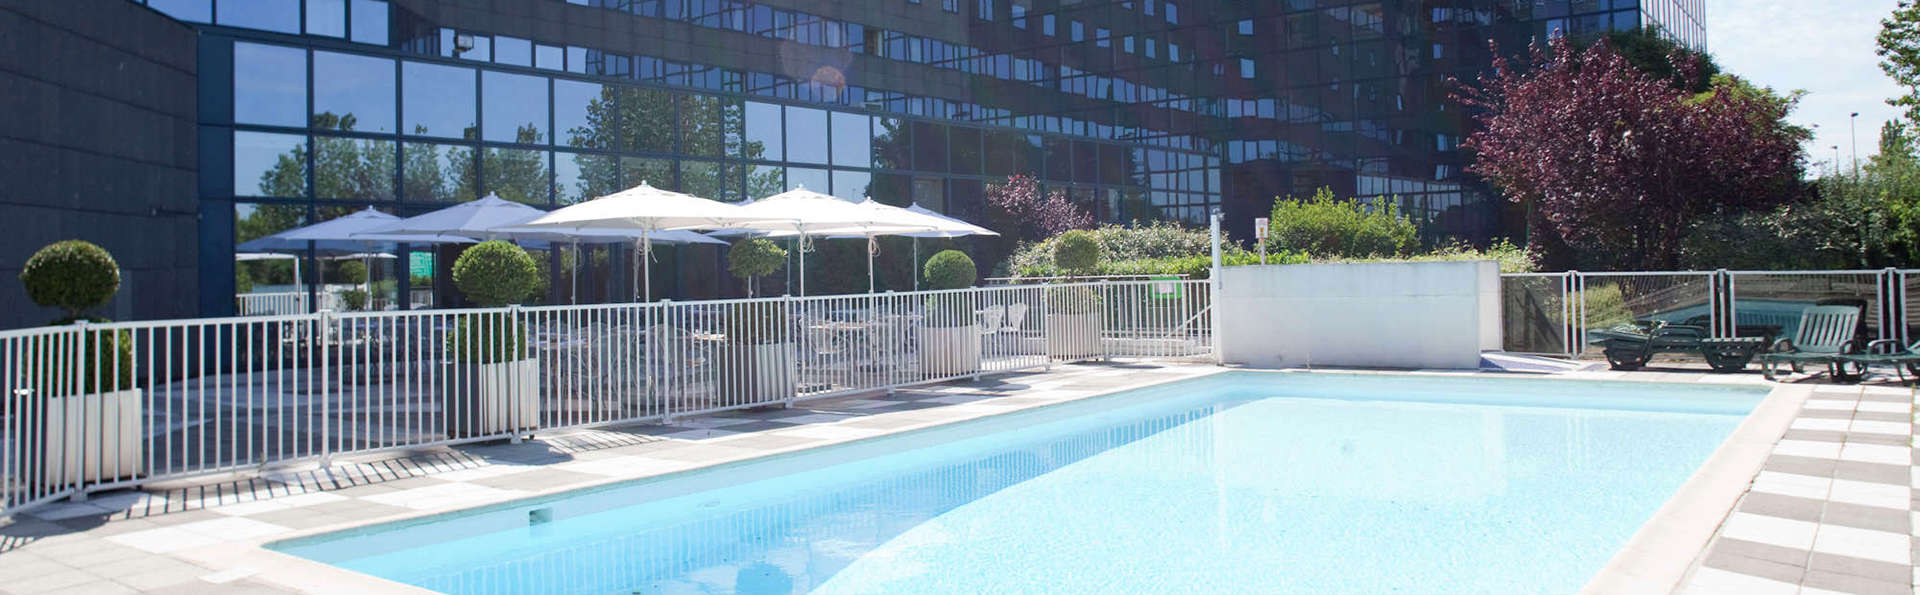 Novotel Marne La Vallée Noisy Le Grand - EDIT_NEW_Pool.jpg